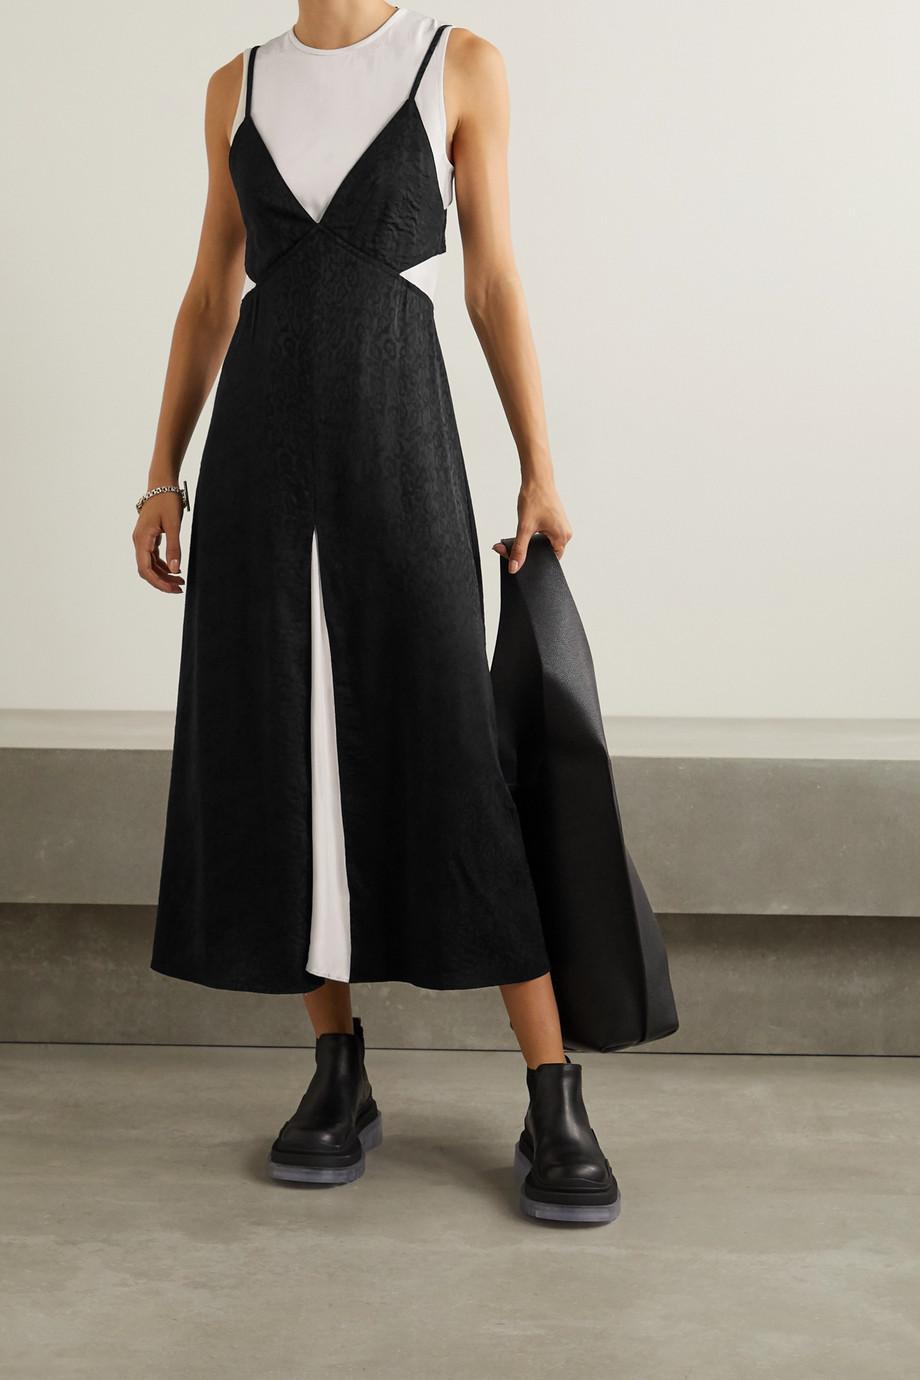 Proenza Schouler White Label Layered satin-jacquard and crepe midi dress